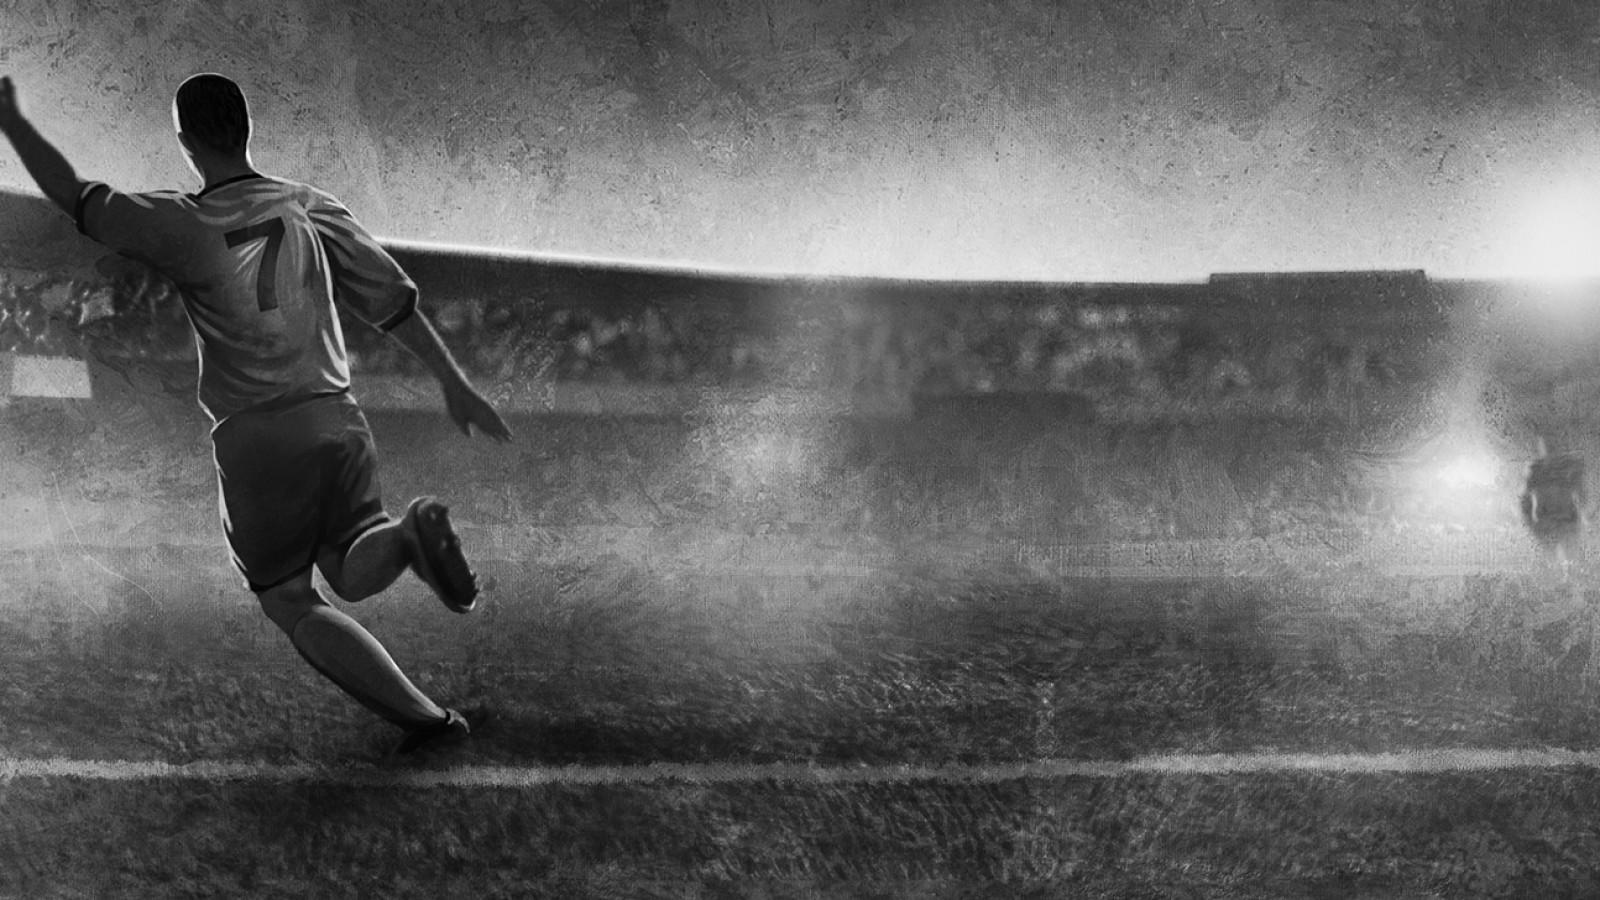 c367aaf181 Gol de muro de Marcelinho Carioca